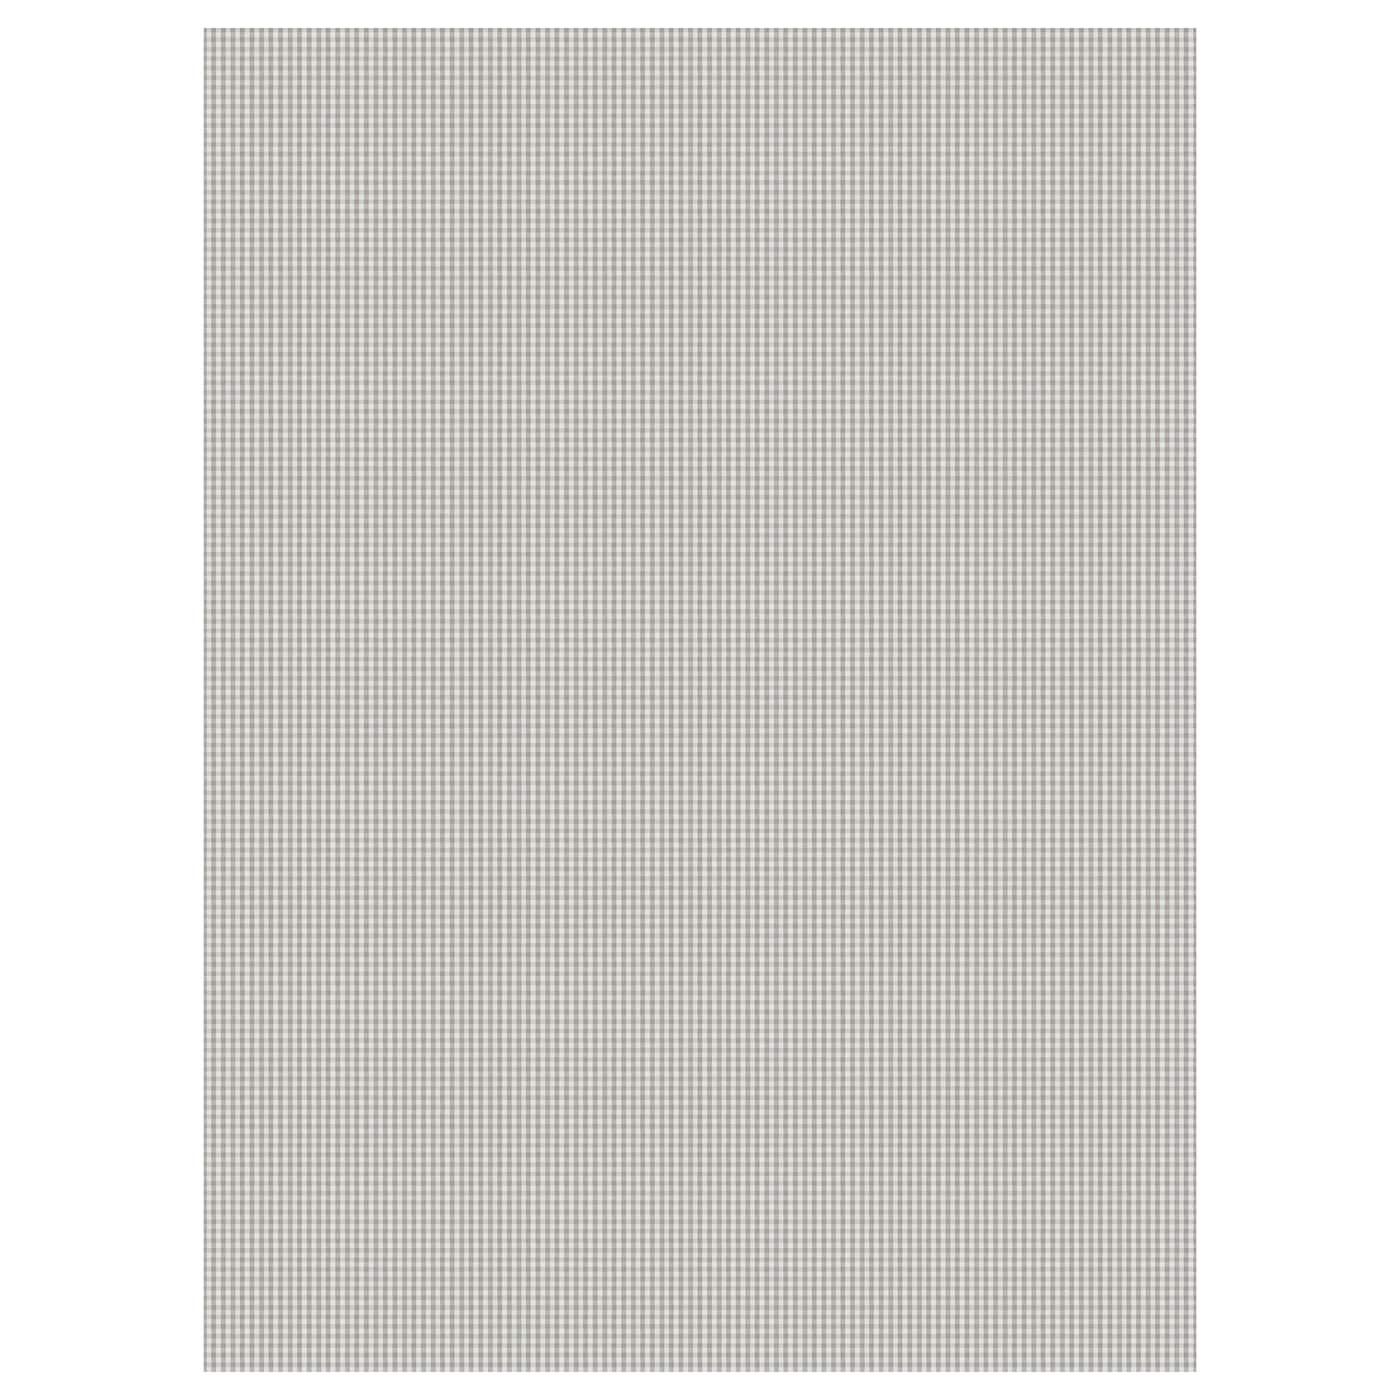 berta ruta tissu au m tre petit carreau gris 150 cm ikea. Black Bedroom Furniture Sets. Home Design Ideas